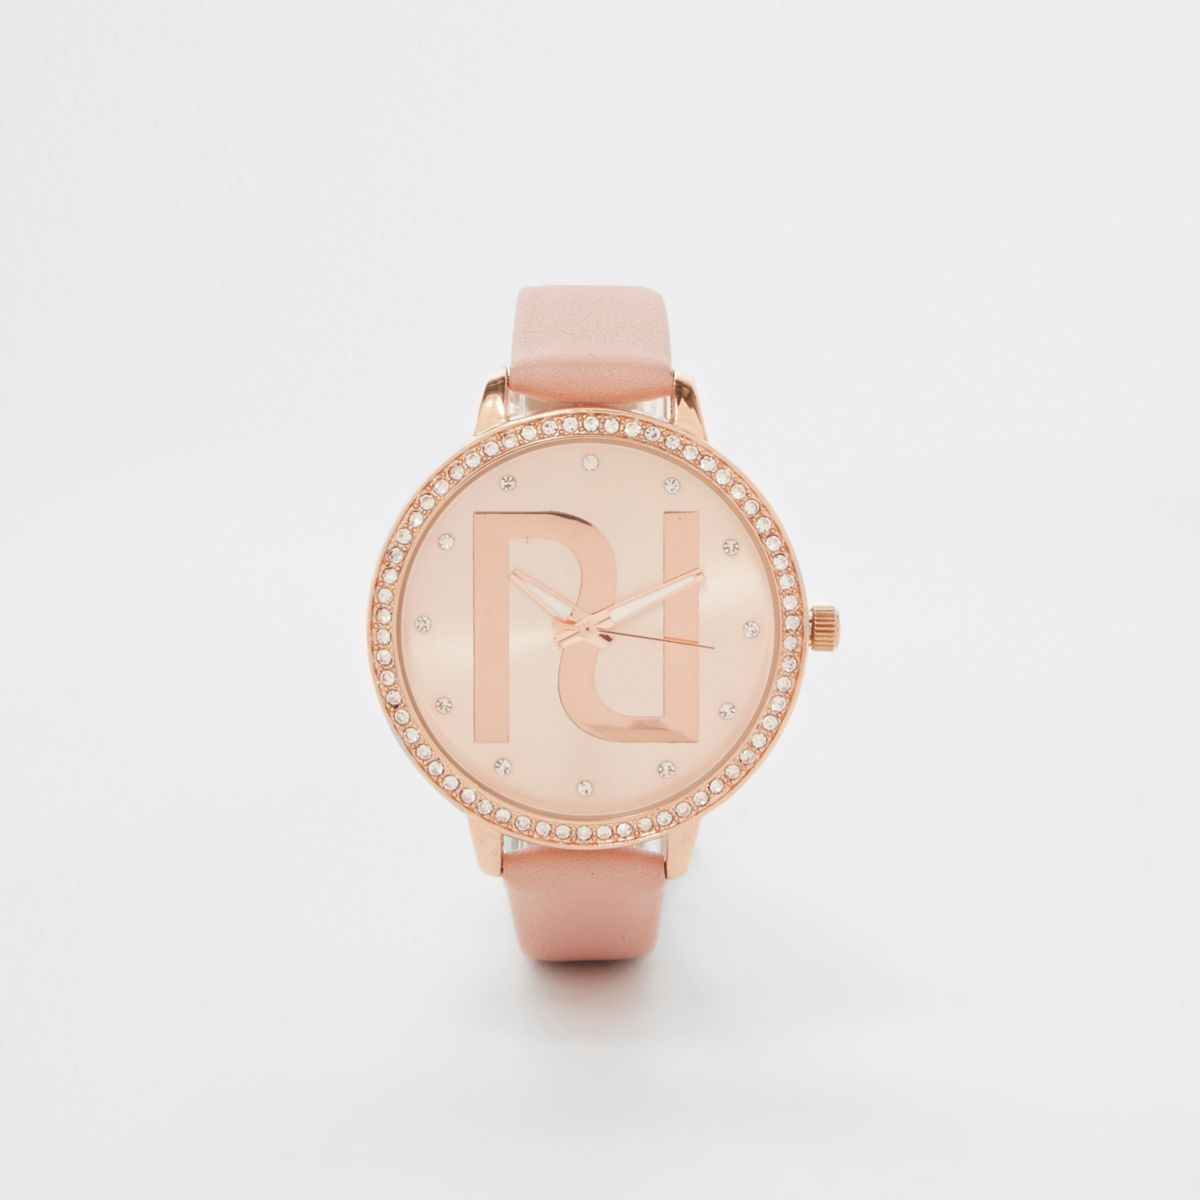 Rose gold tone RI branded watch